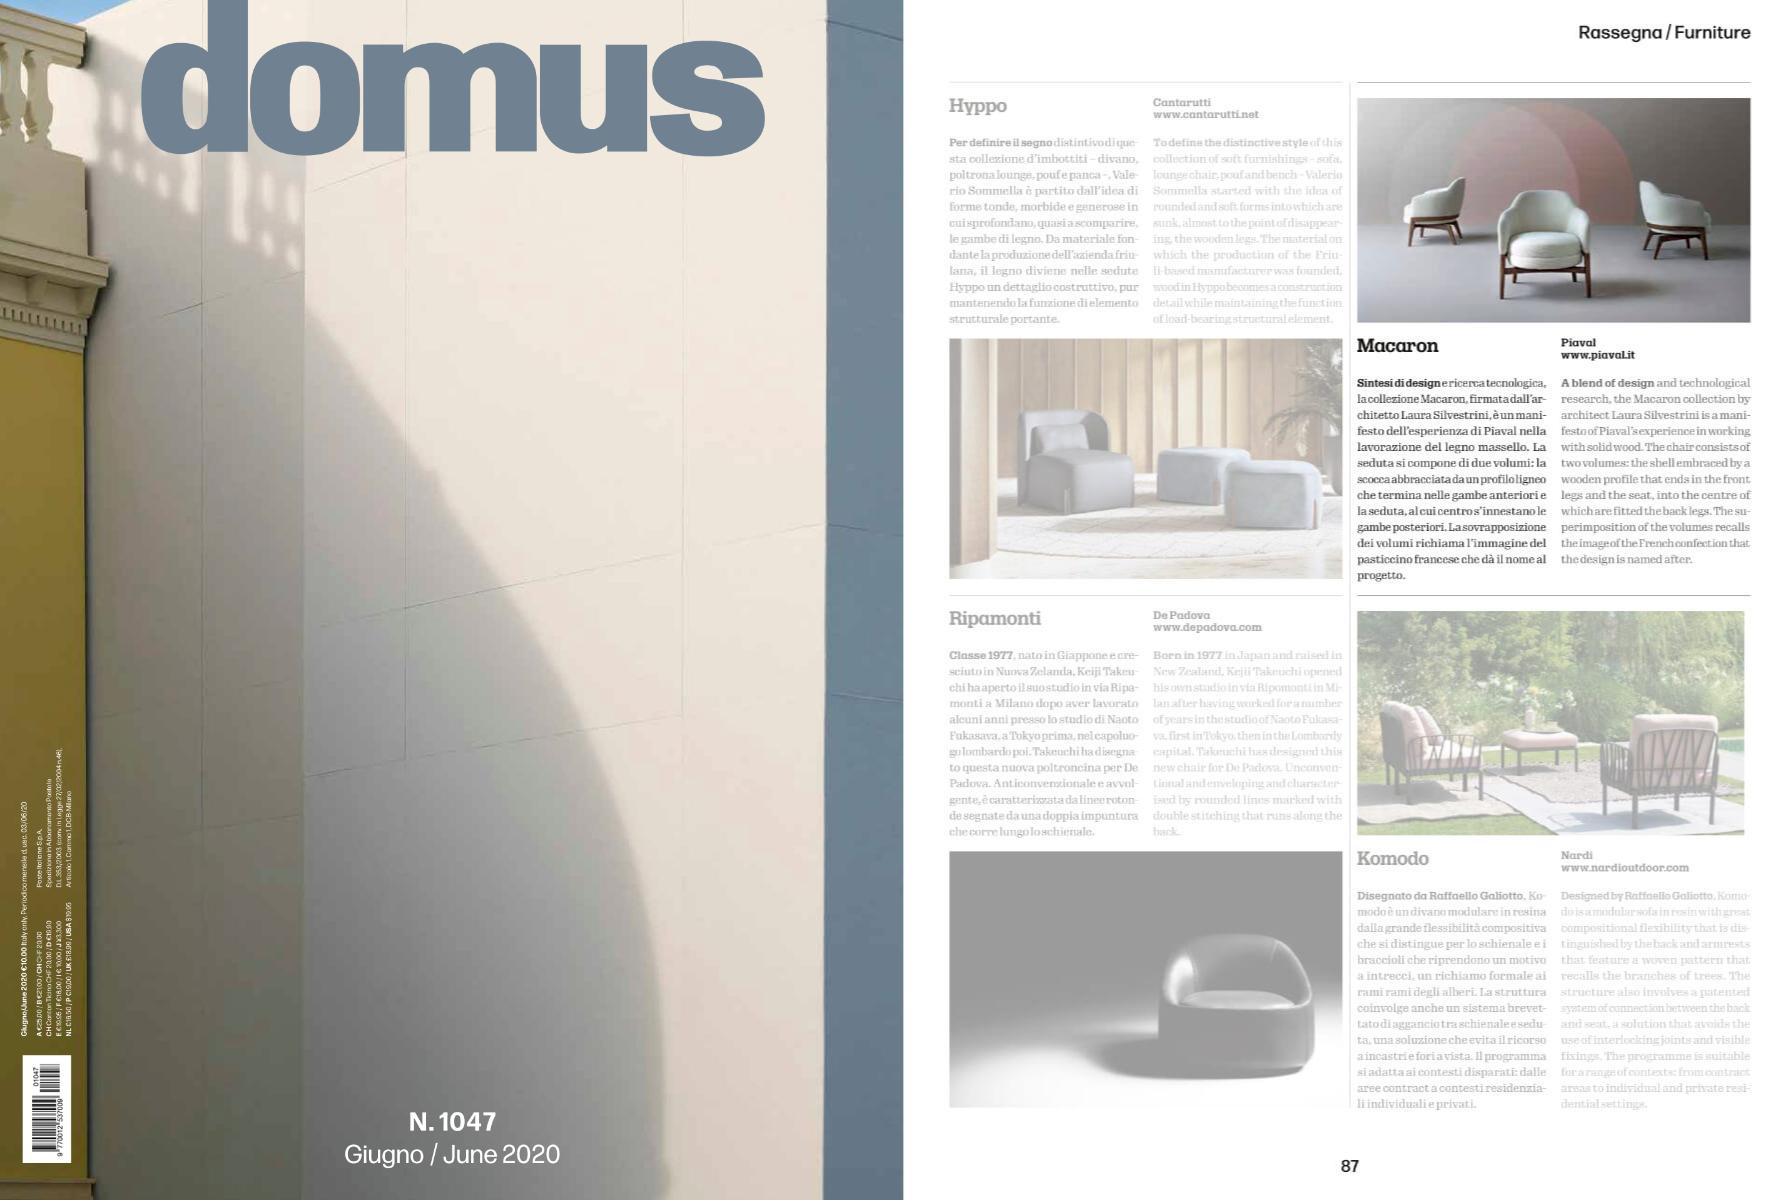 Macaron llounge featured on domus magazine